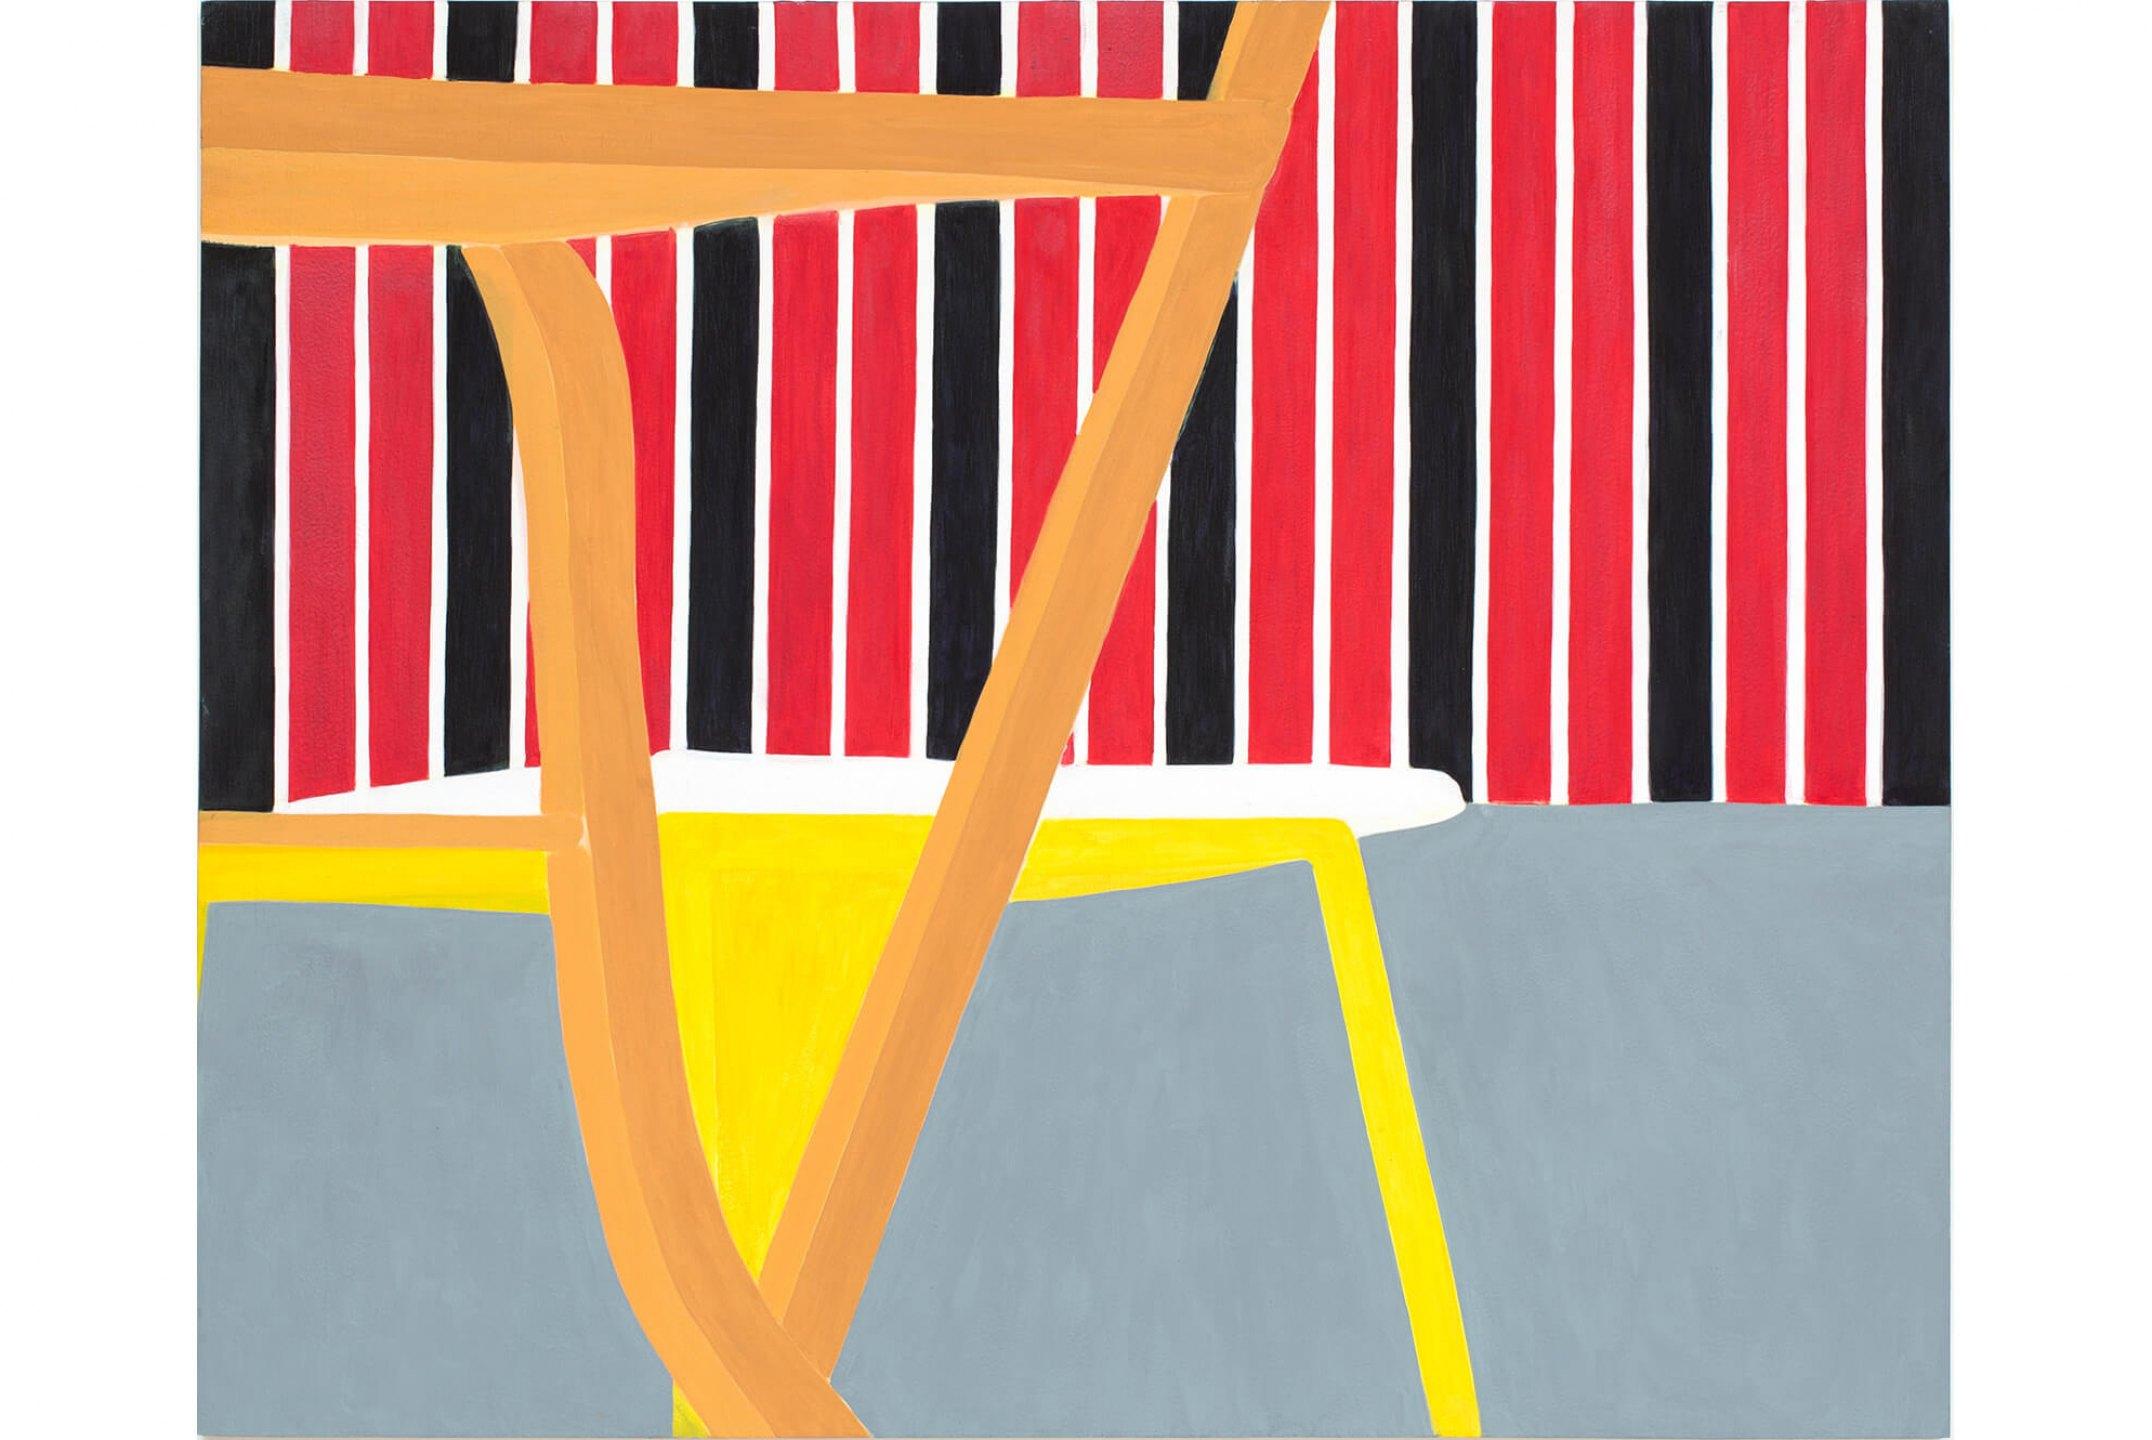 Patricia Leite, <em>Beira-Serra</em>,2012, oil on wood, 90×110 cm - Mendes Wood DM